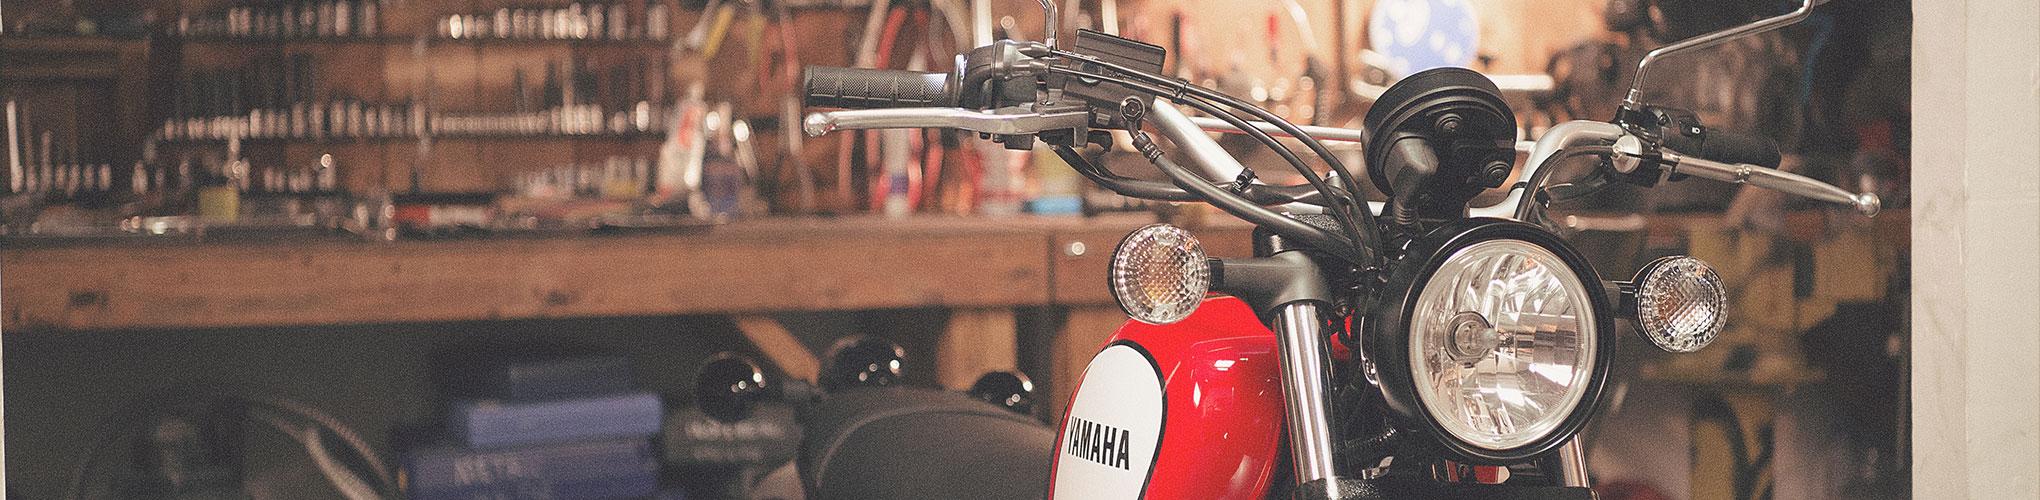 Yamaha Zoetermeer | MotorCentrumWest